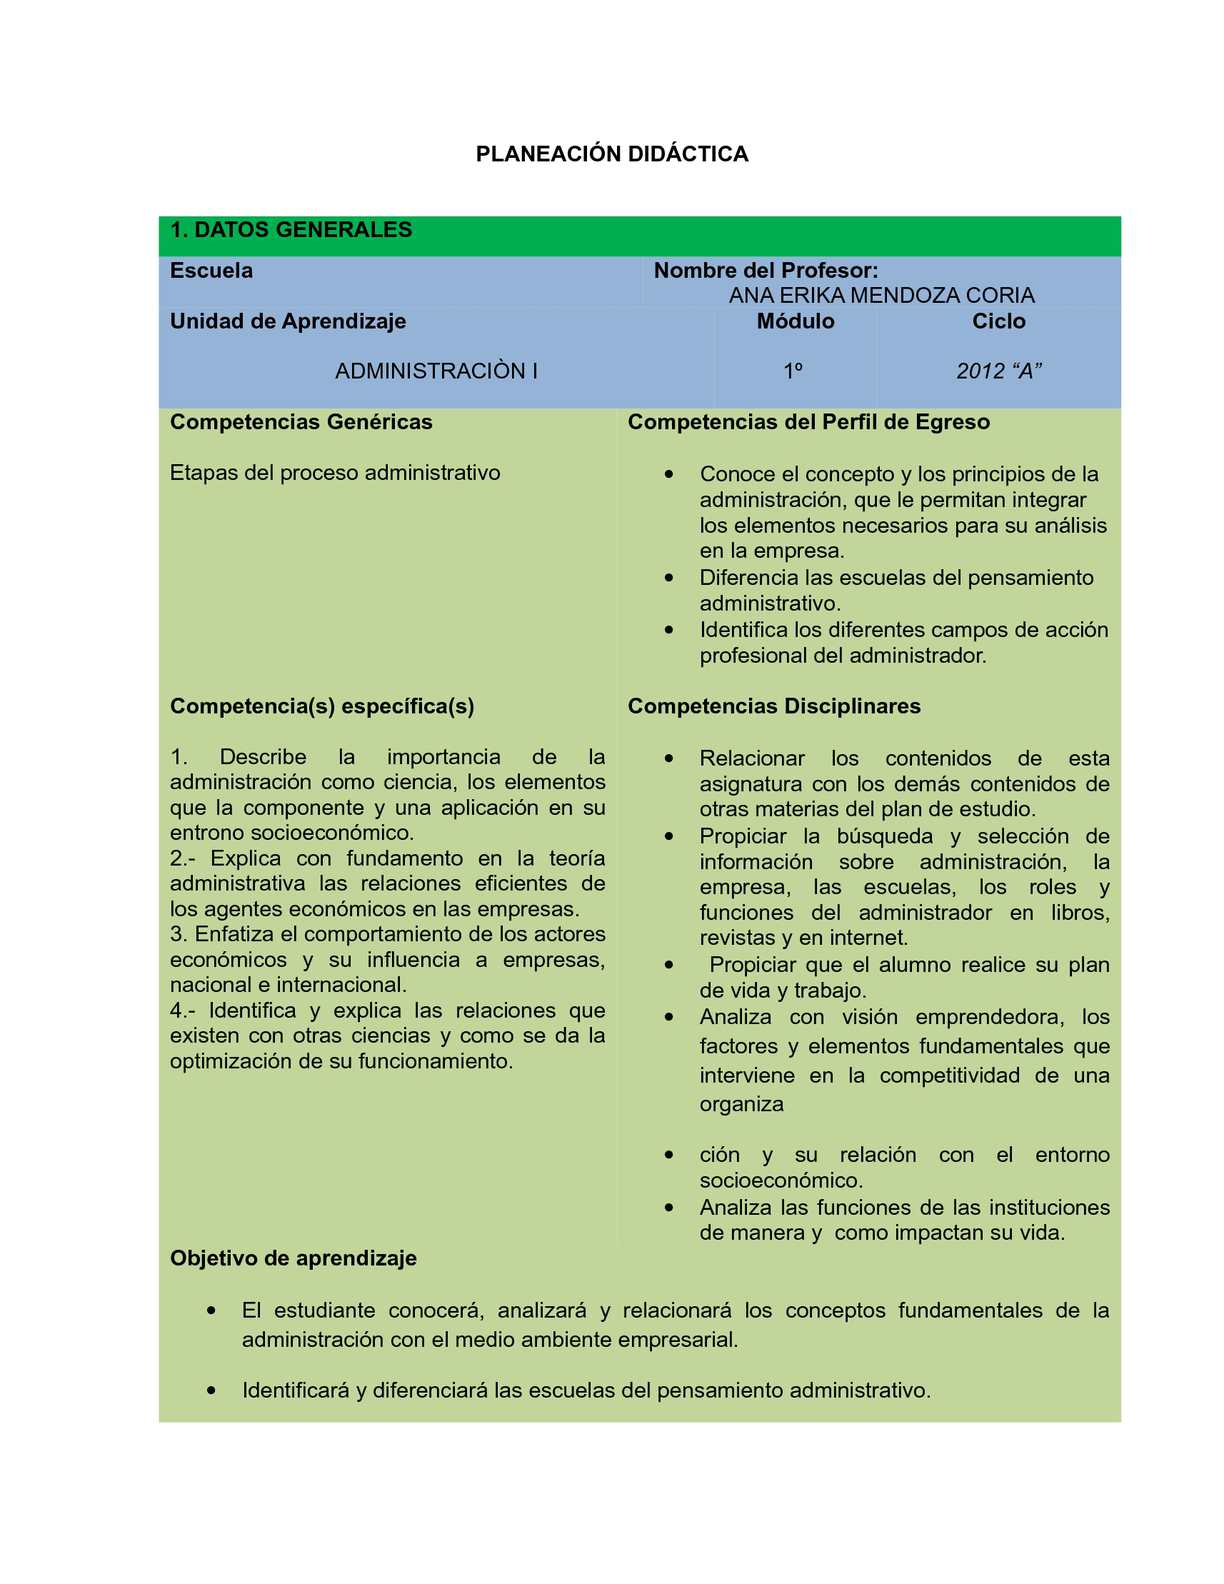 ADMINISTRACION II DGB